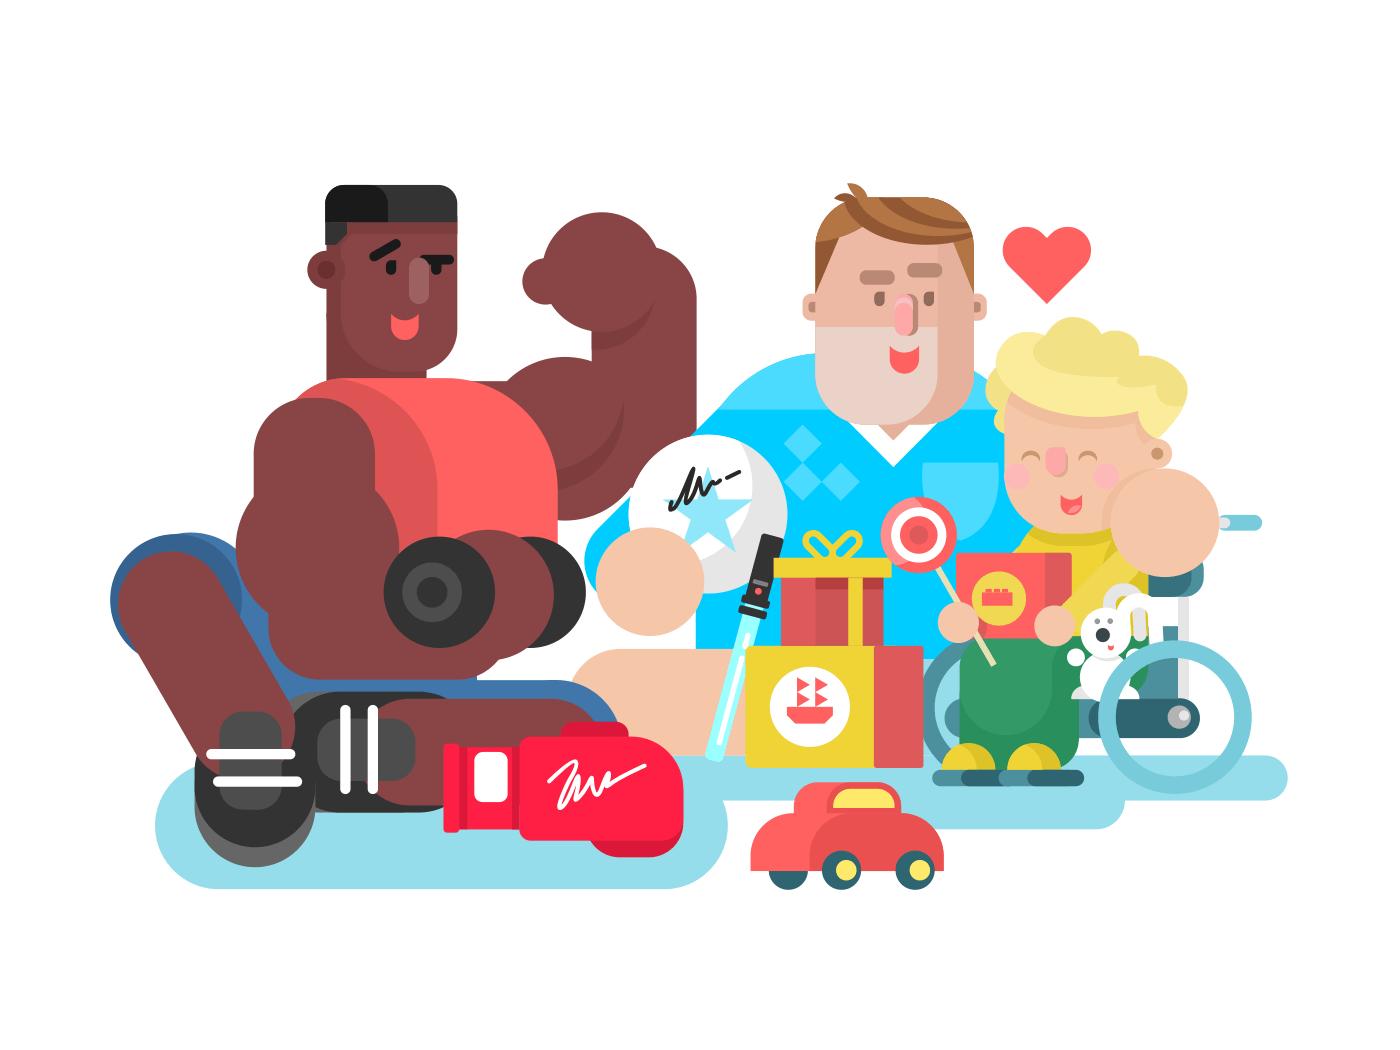 Charity flat vector illustration